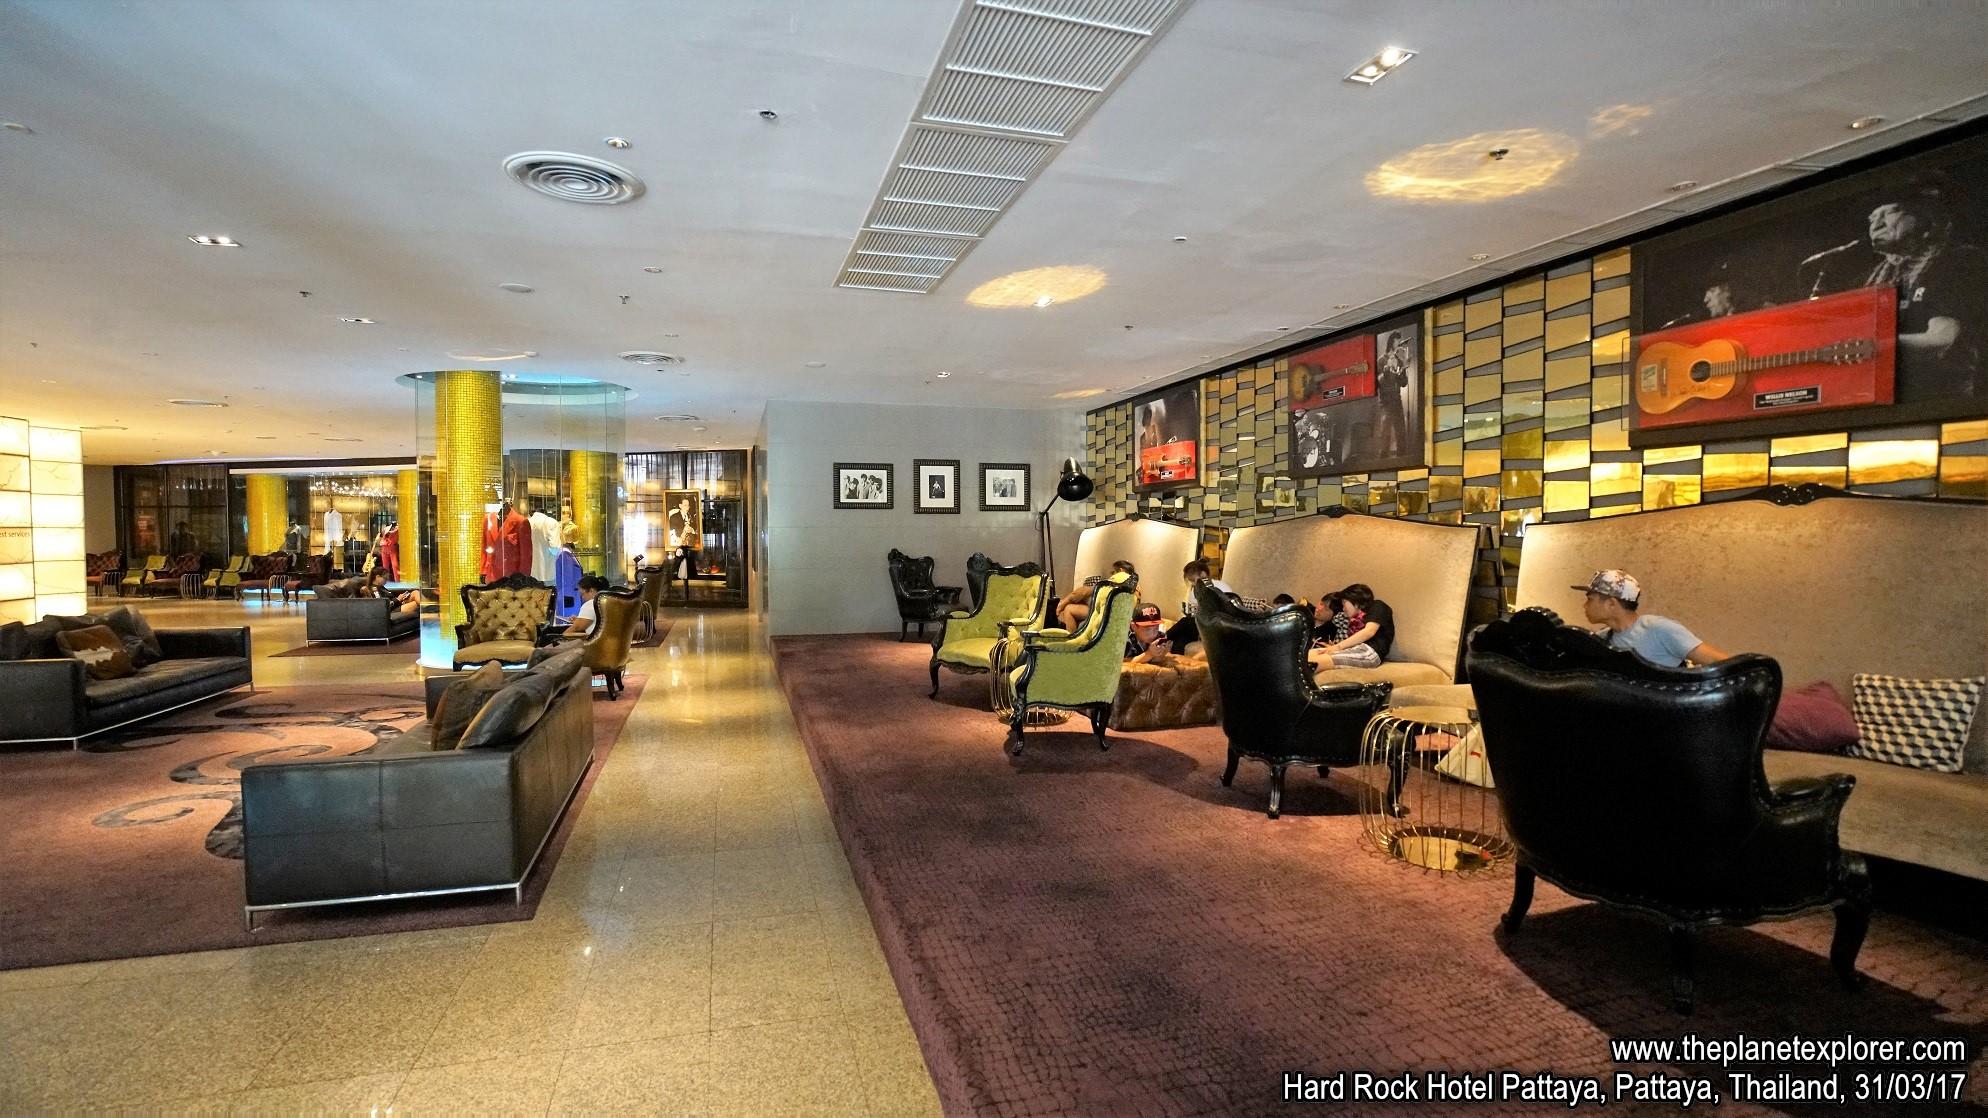 2017-03-31_1325_Thailand_Pattaya_Hard Rock Hotel Pattaya_DSC04164_s7R2_LR_@